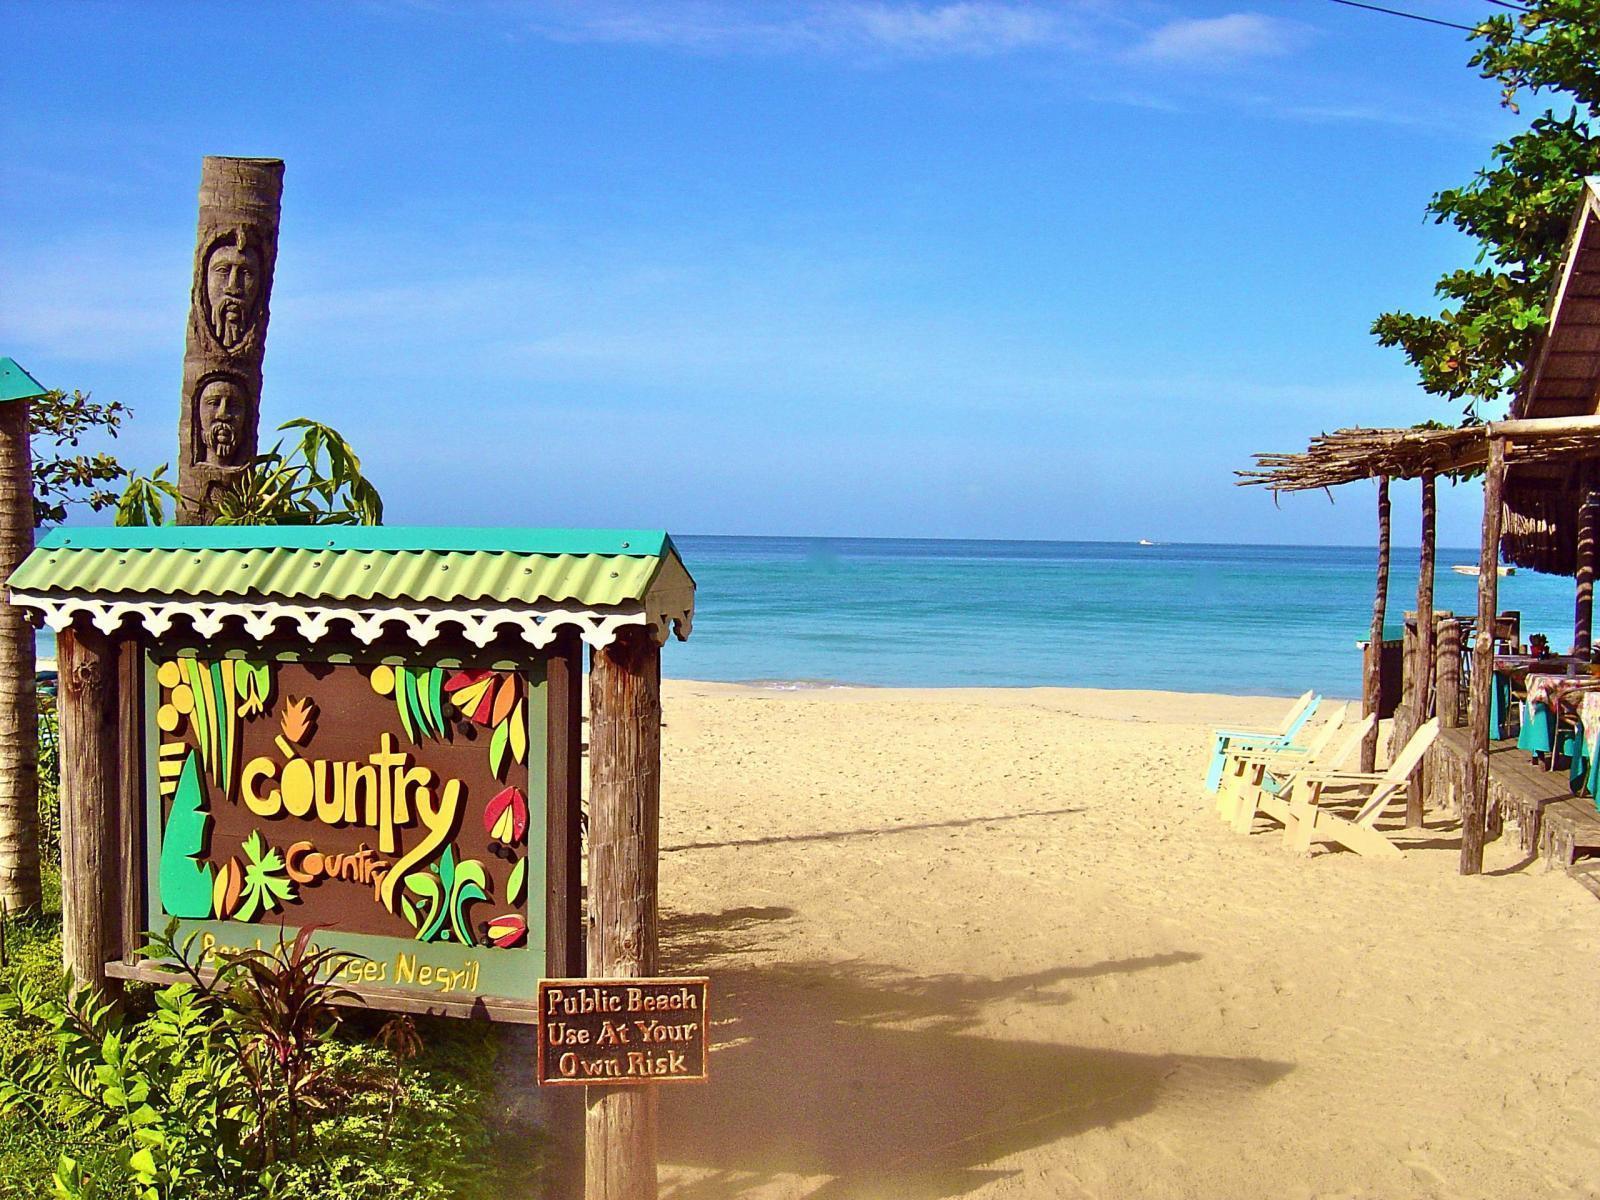 Jamaican Beaches Wallpaper - Viewing Gallery